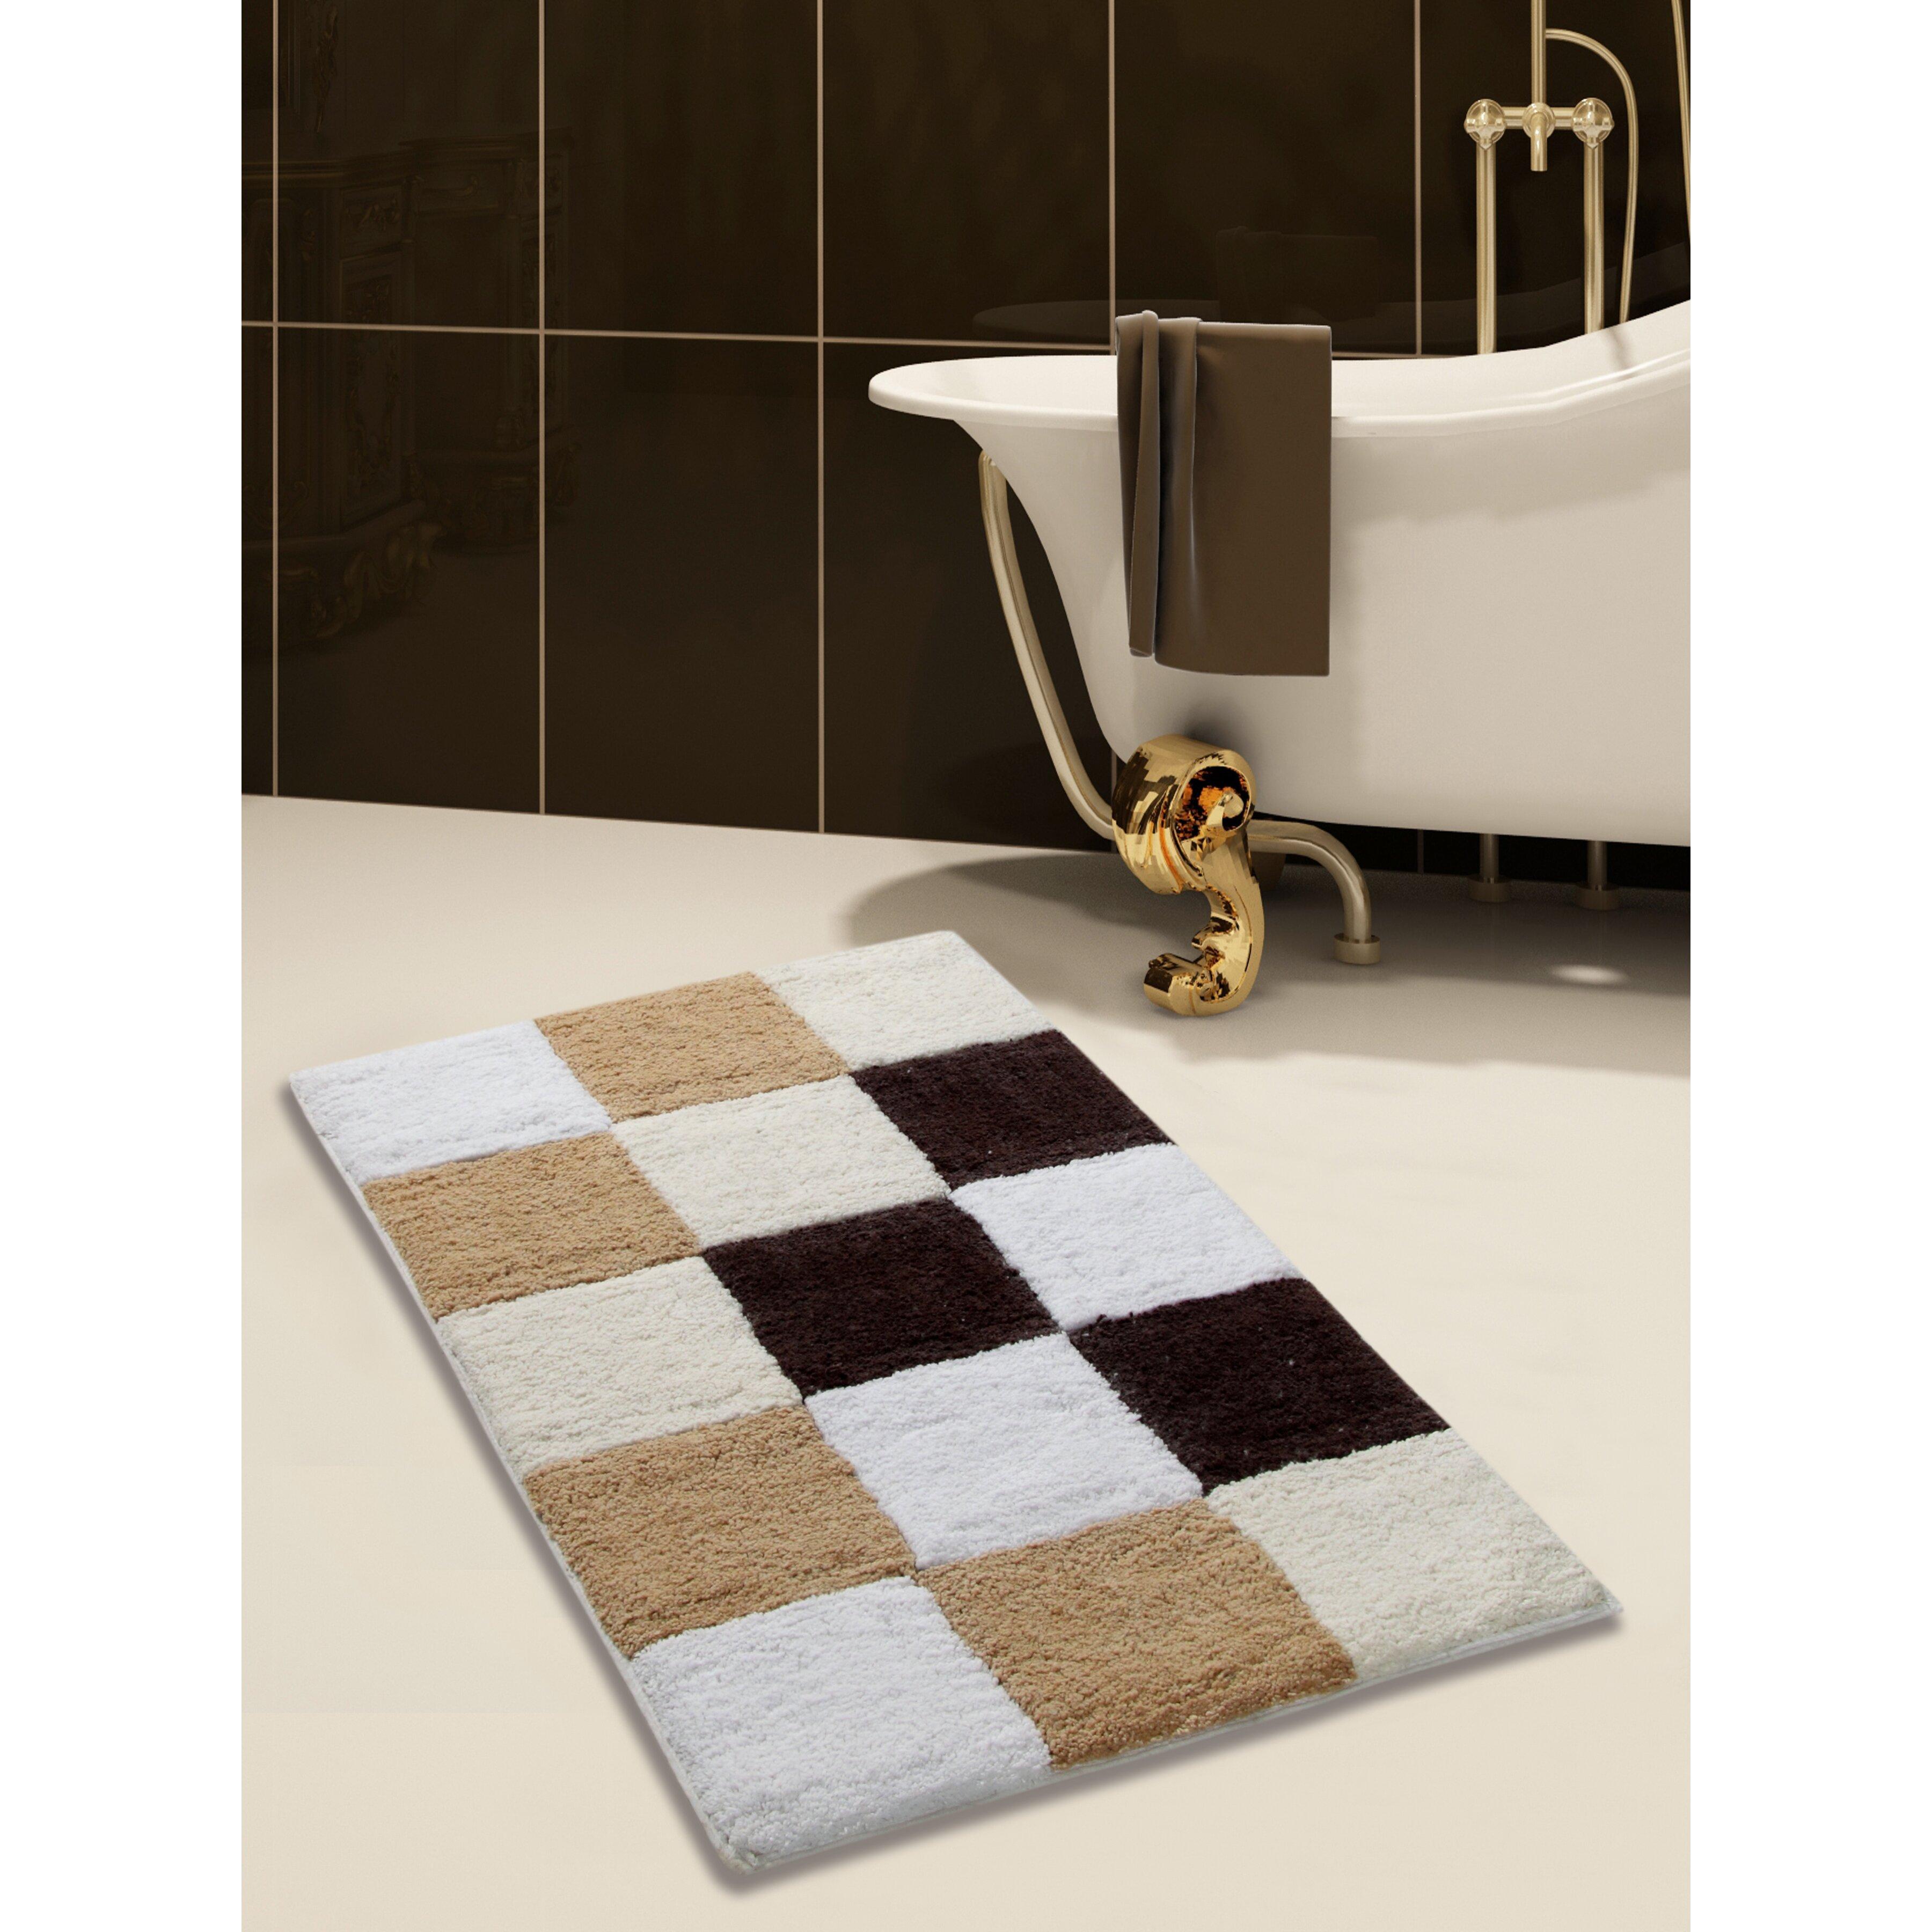 100 cotton bath rugs | roselawnlutheran